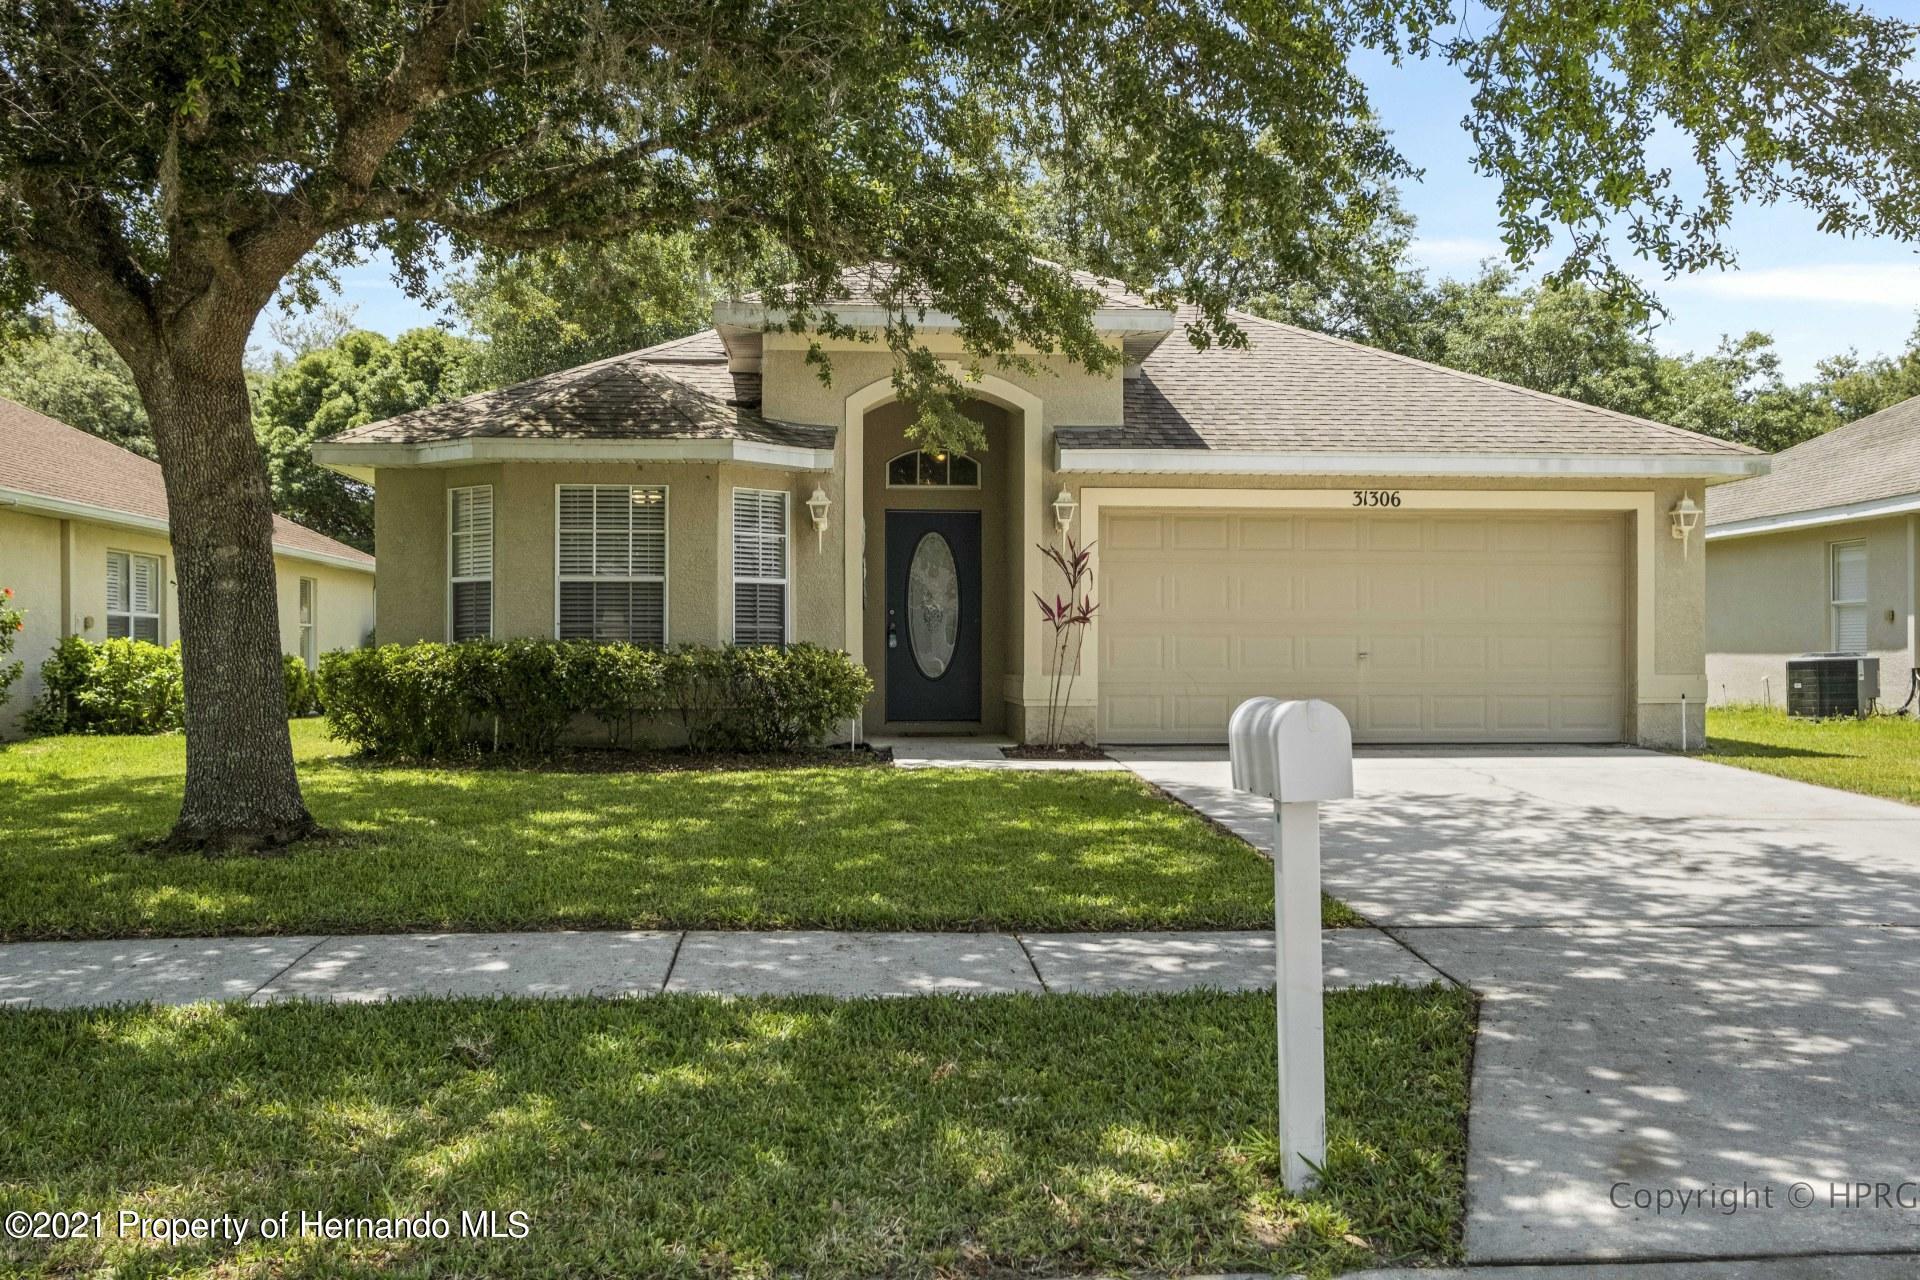 Details for 31306 Spoonflower Way, Brooksville, FL 34602